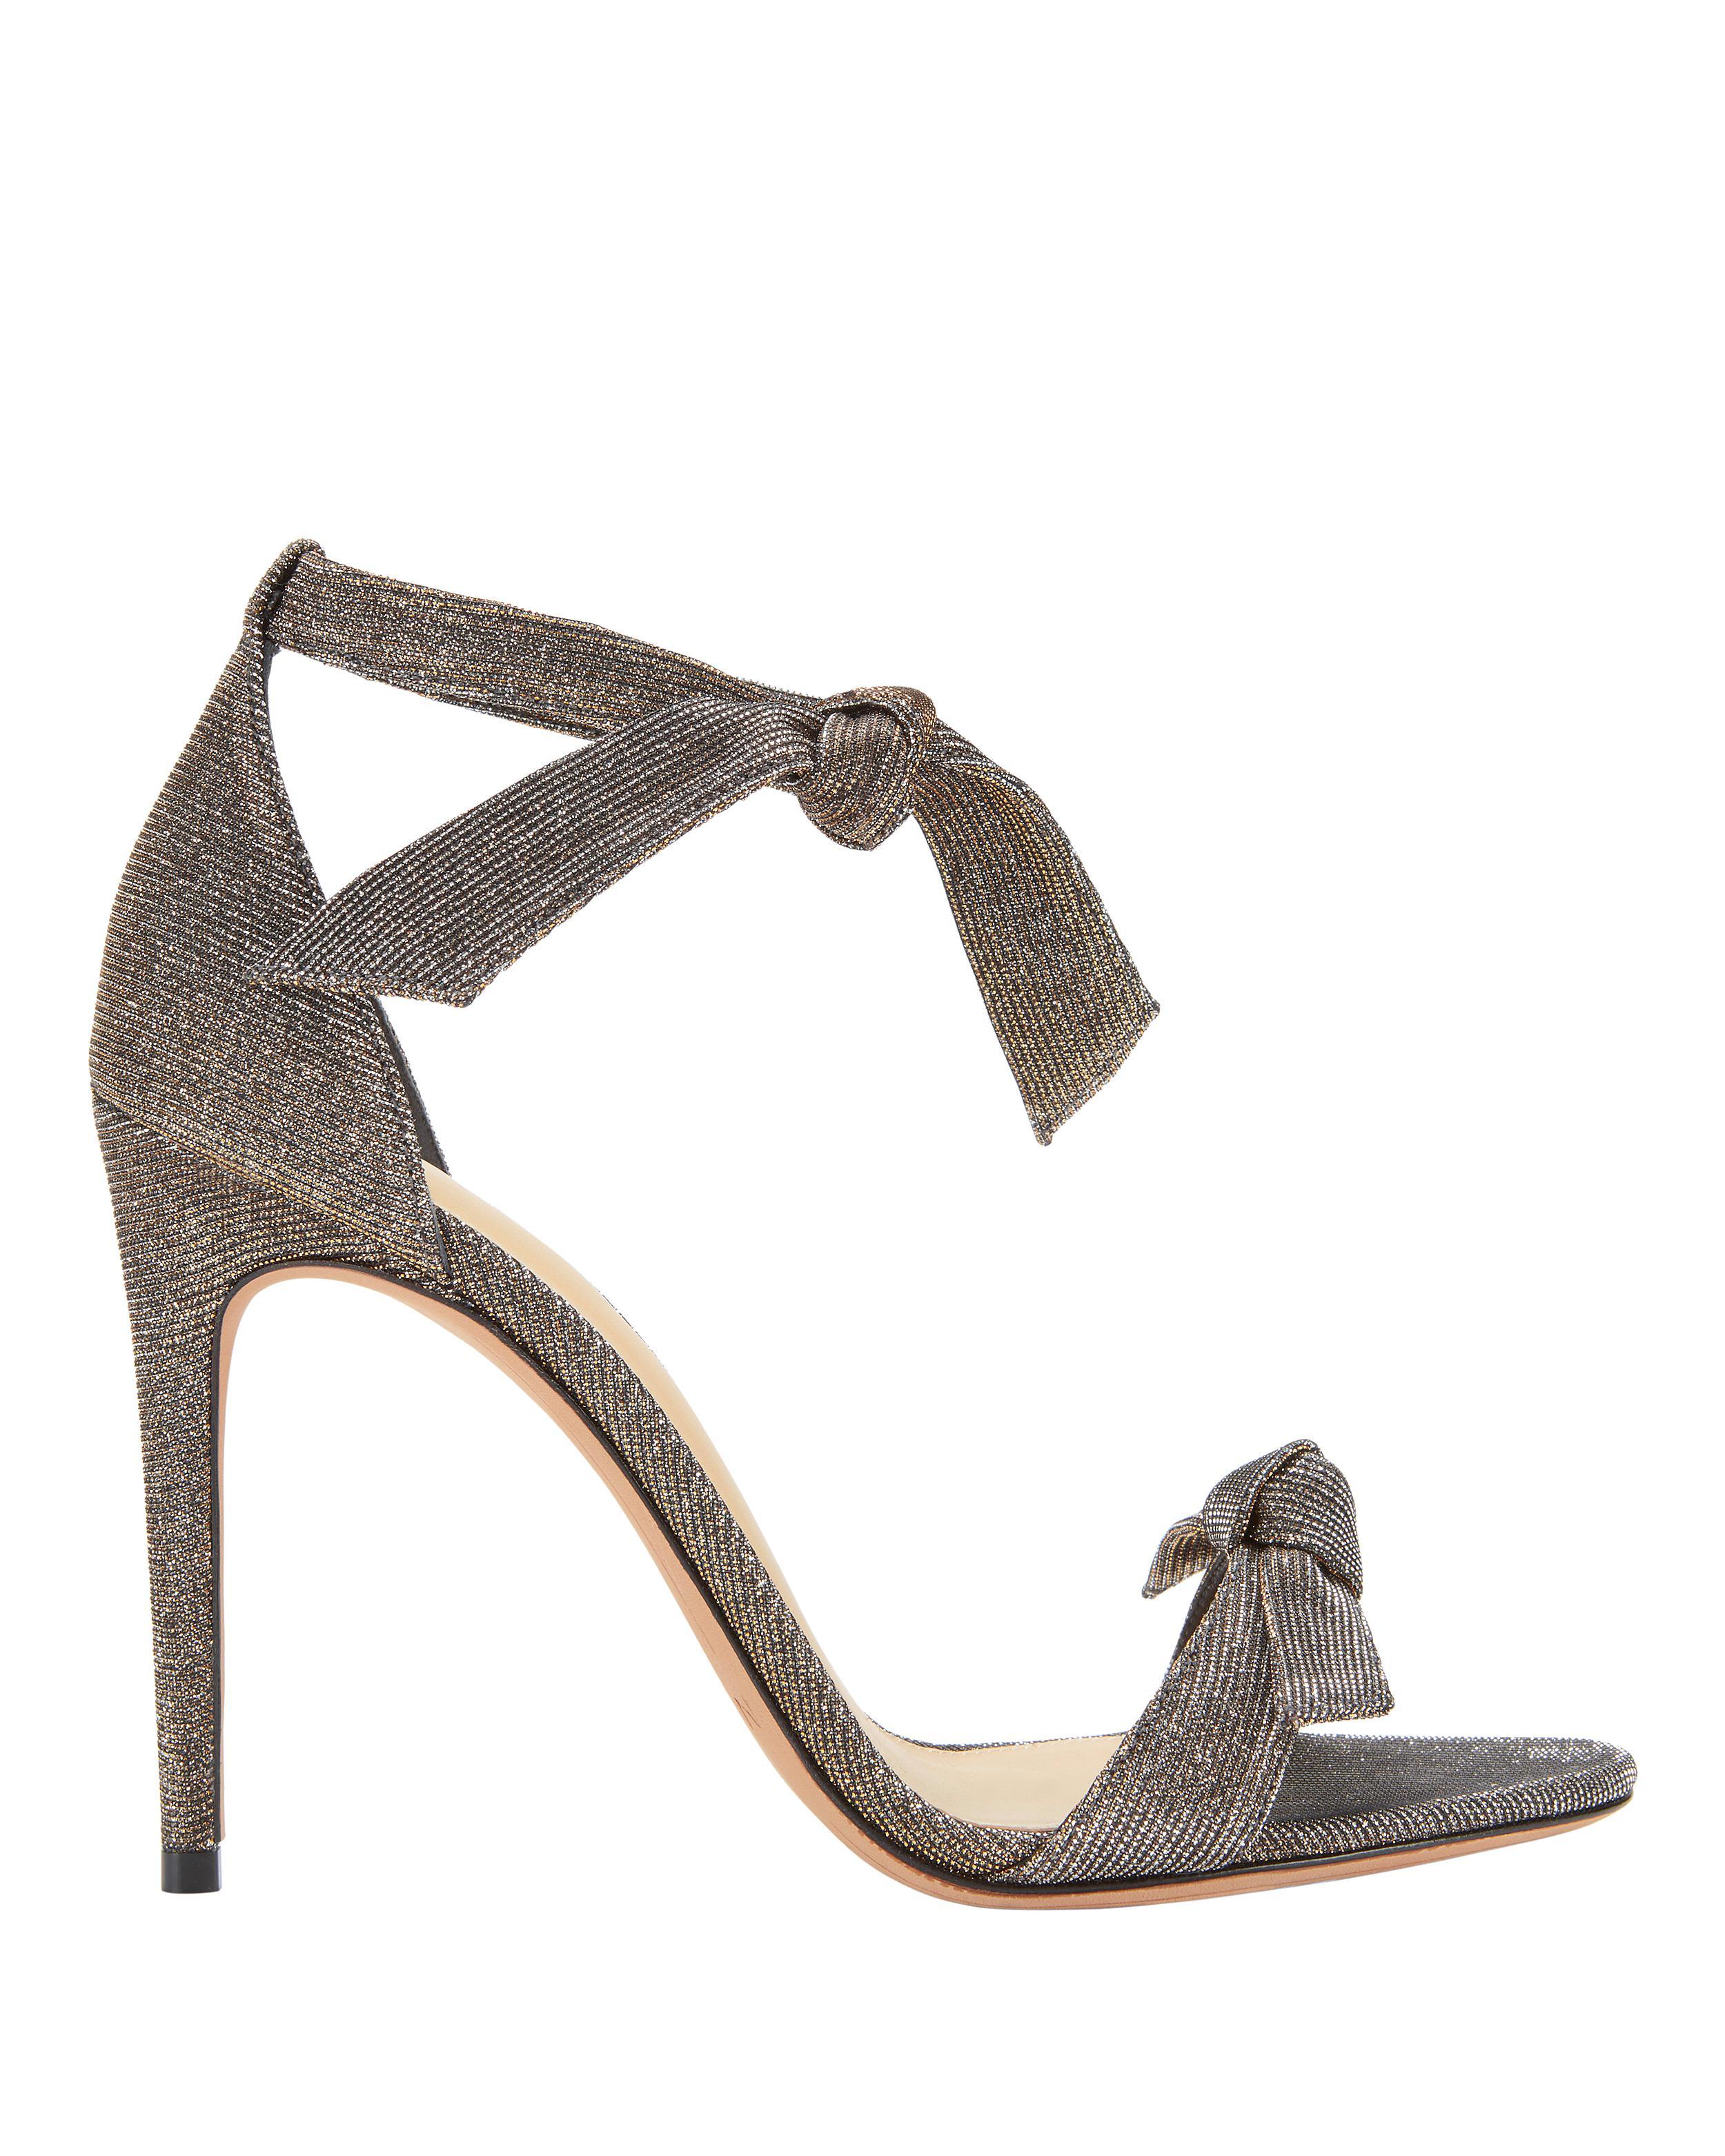 Bow Clarita Lyst Sandals Shimmer Dbxwreco Birman Alexandre Double oWrCBdxe